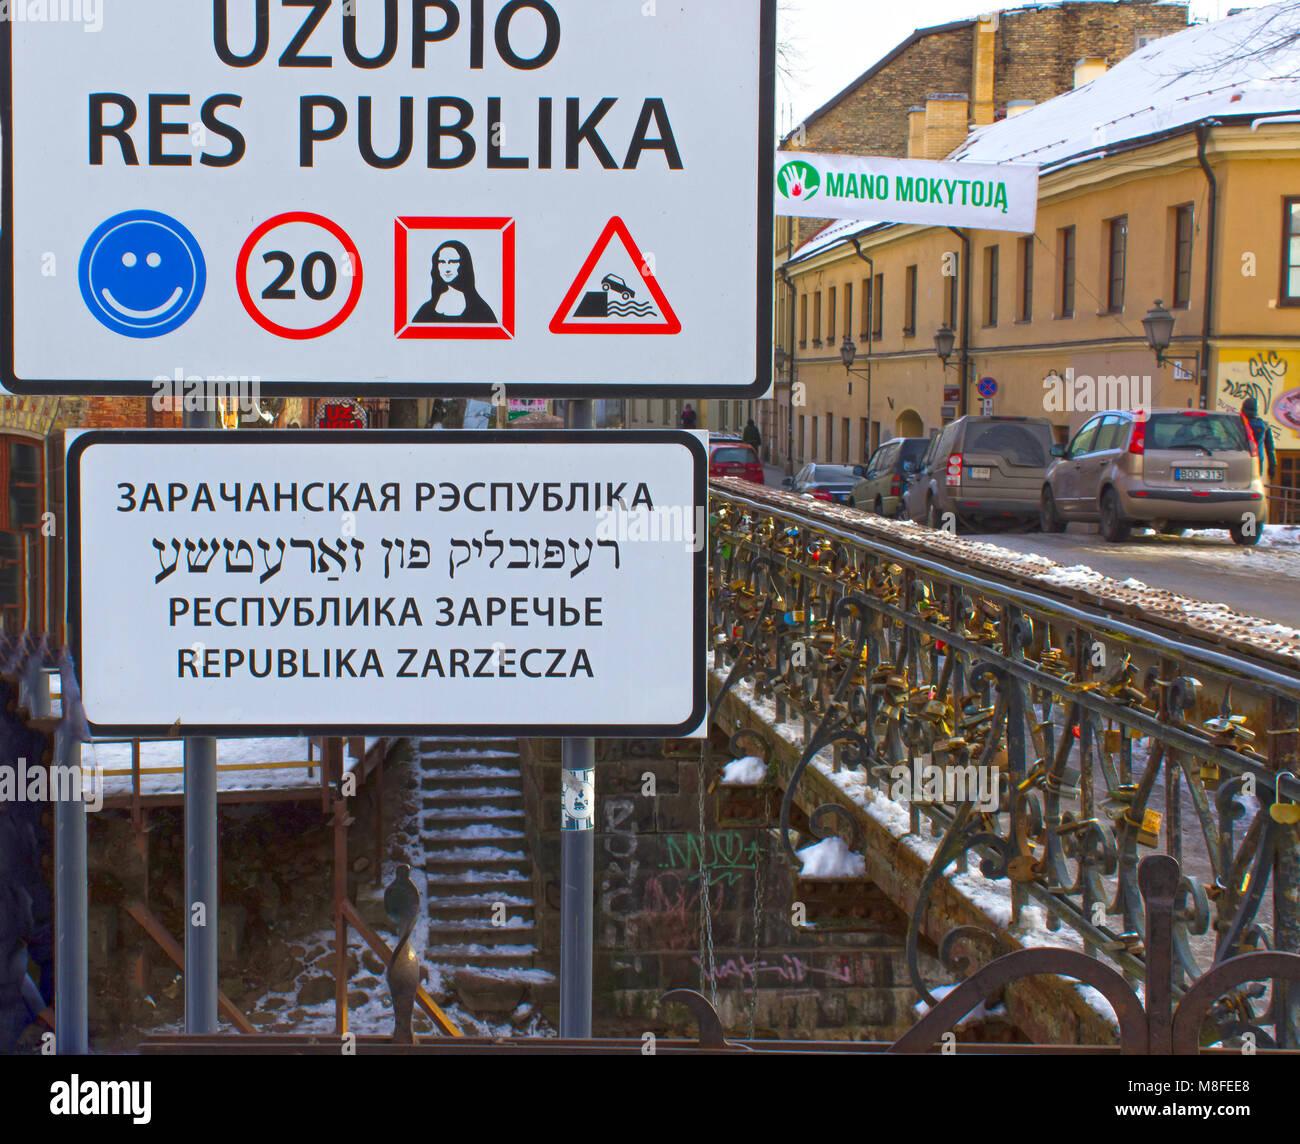 VIlnius, Lithuania - January 05, 2017: Entrance sign to the Republic of Uzupis, a bohemic neighborhood in Vilnius - Stock Image